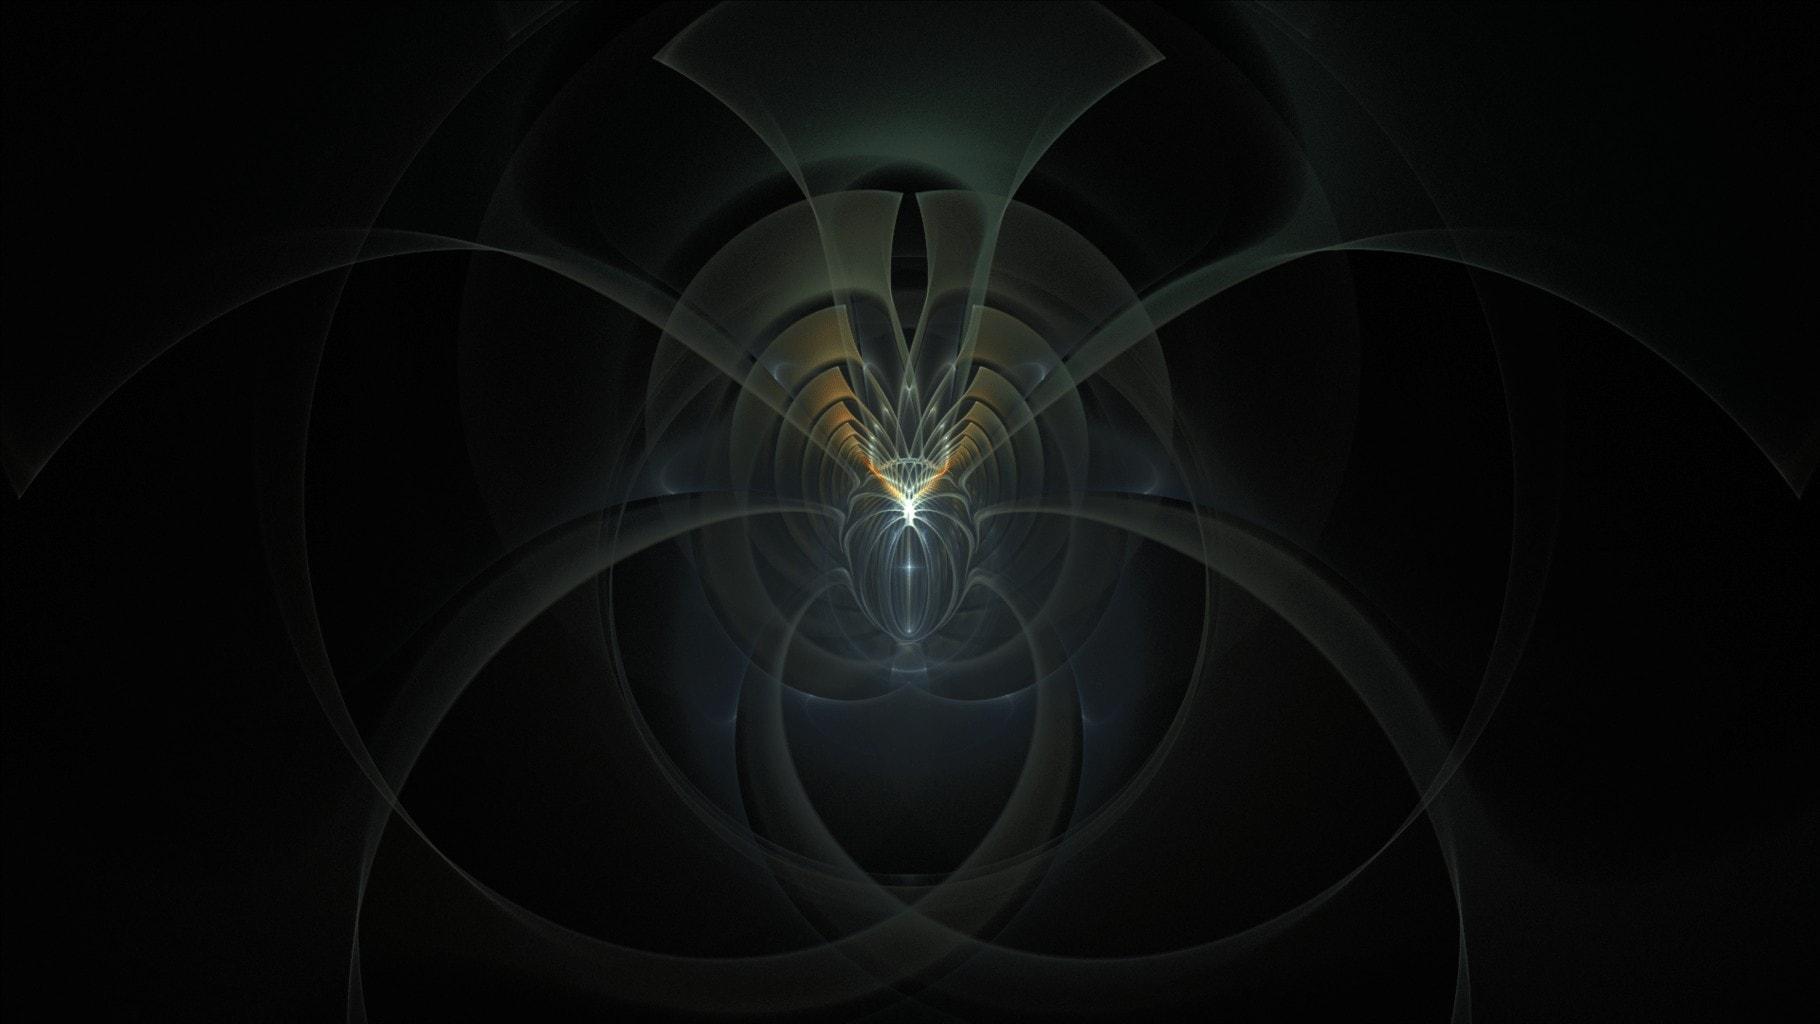 jl 438mac   Fracnaphobia (thanks Thoth for the amazing title)